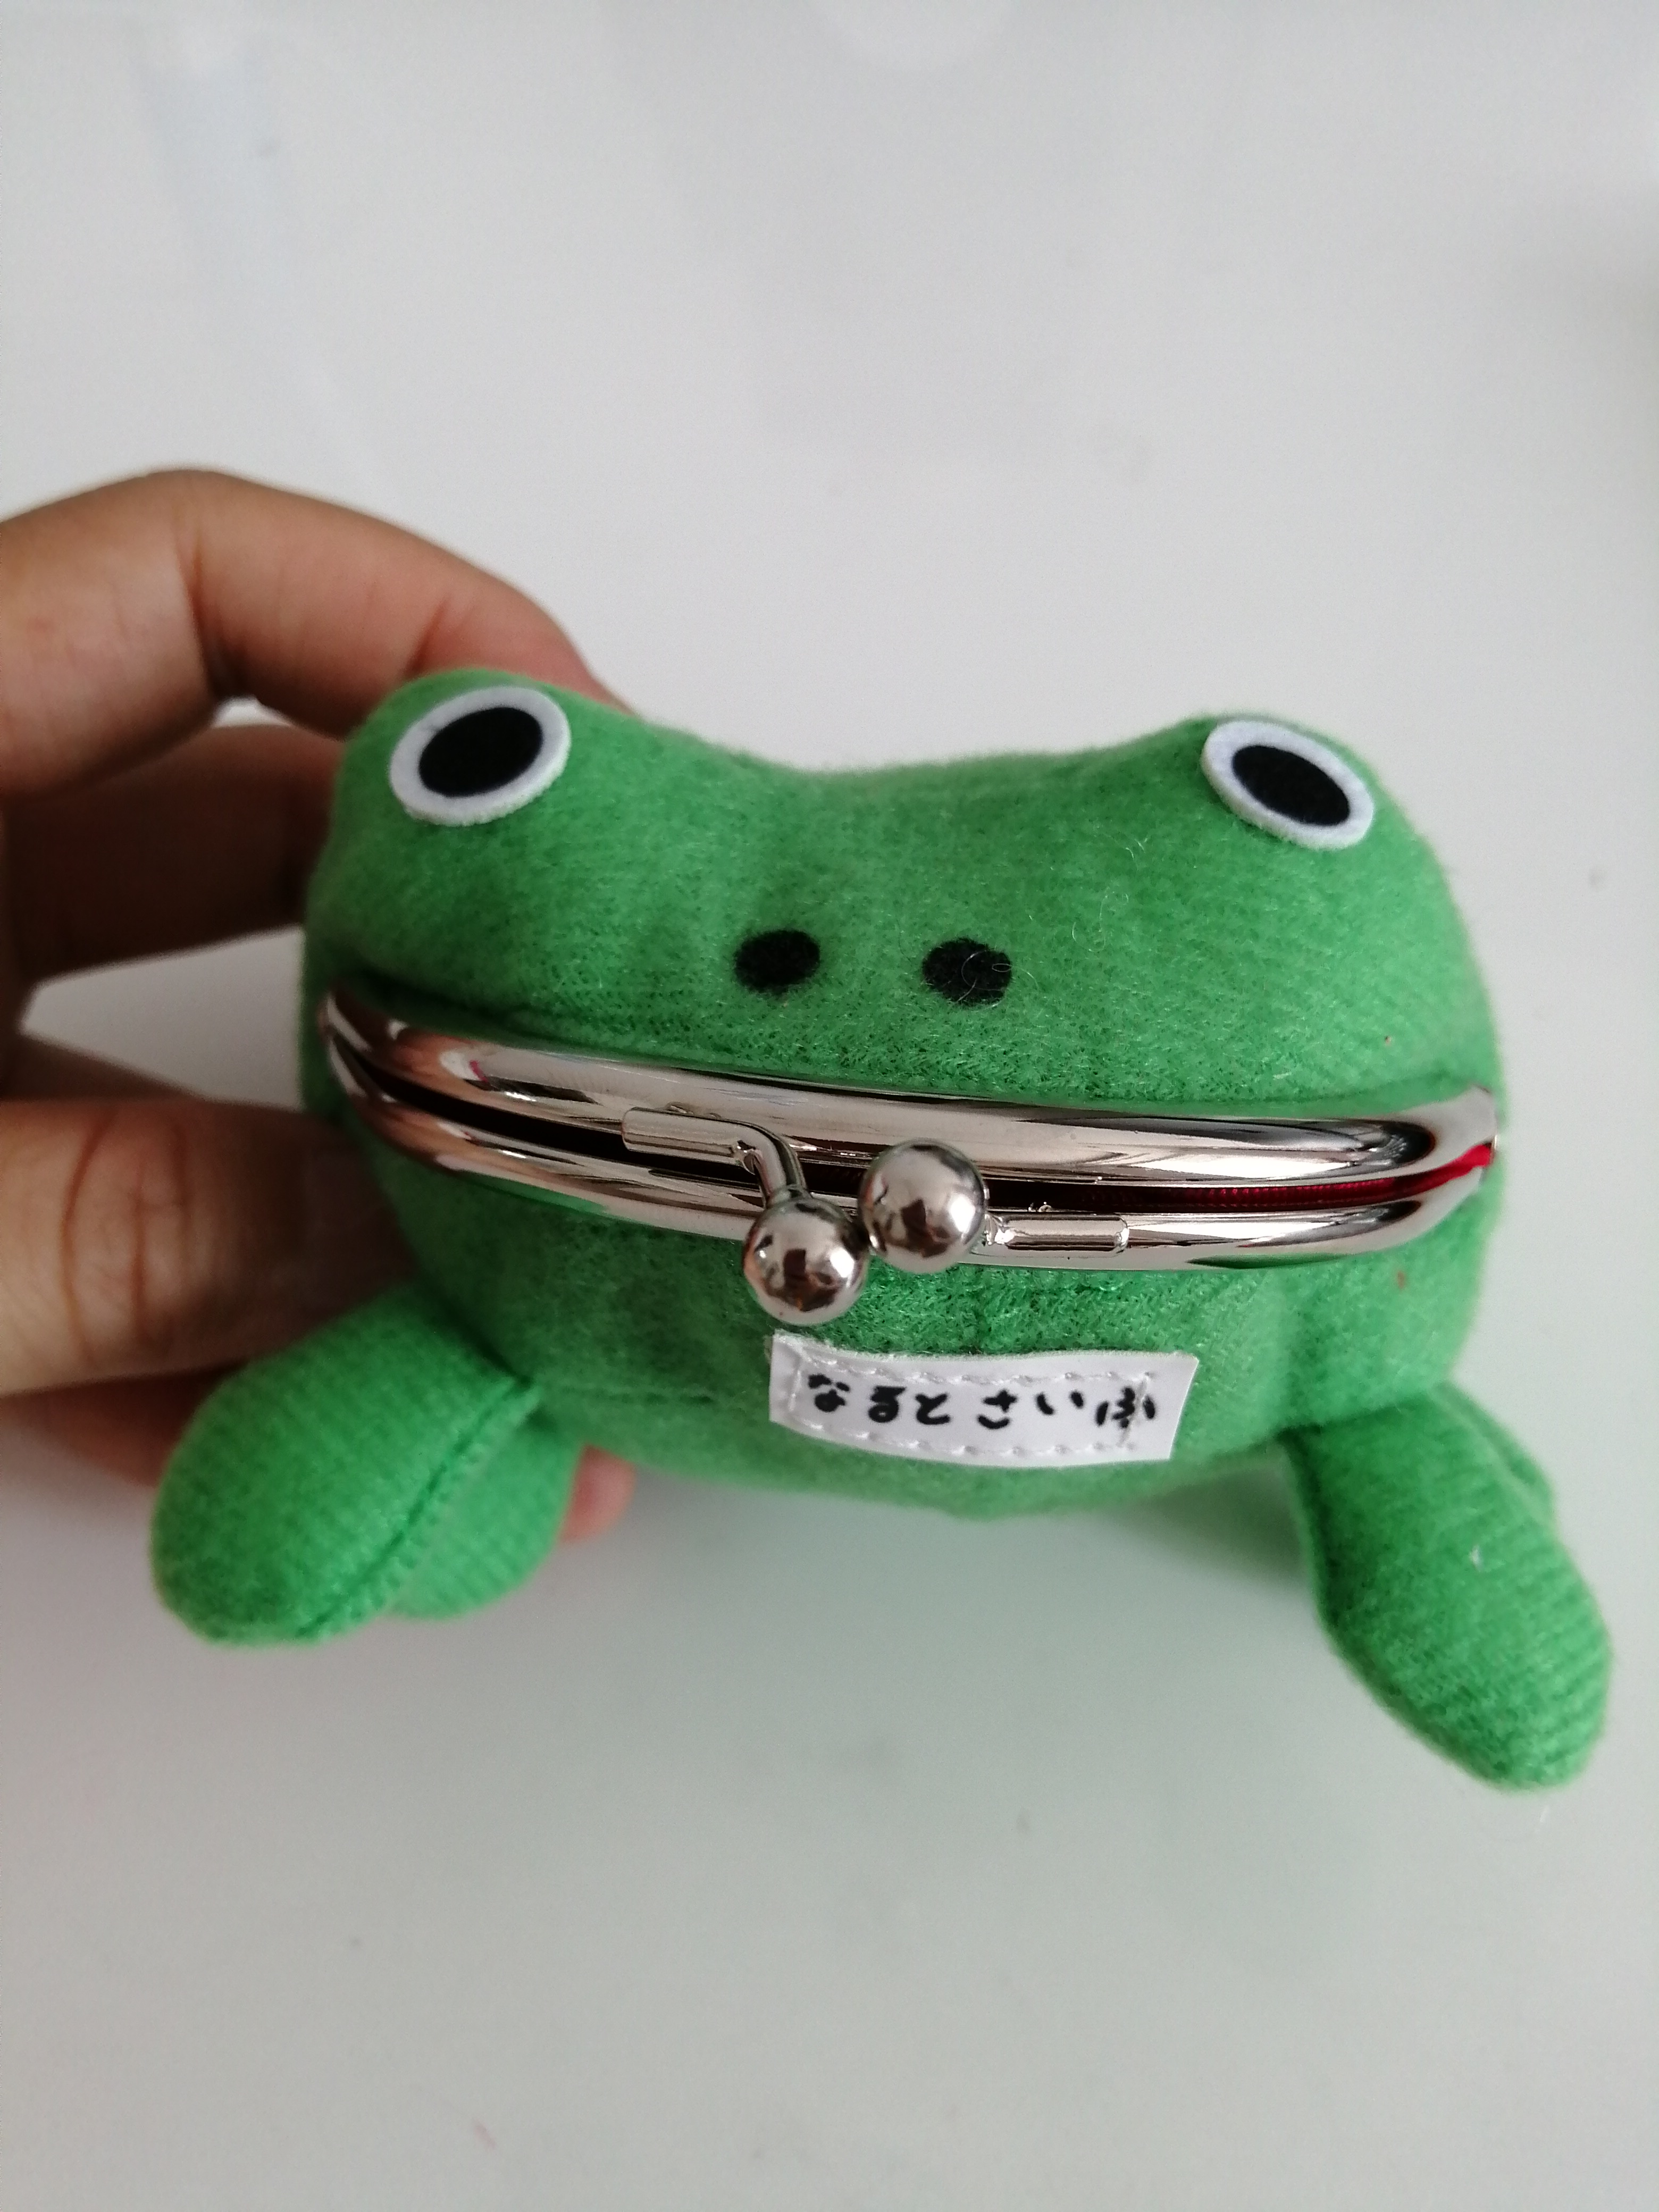 Anime Cartoon frog purse Wallet Coin Purse Originality Manga Flannel Wallet Cheap Cute Purse